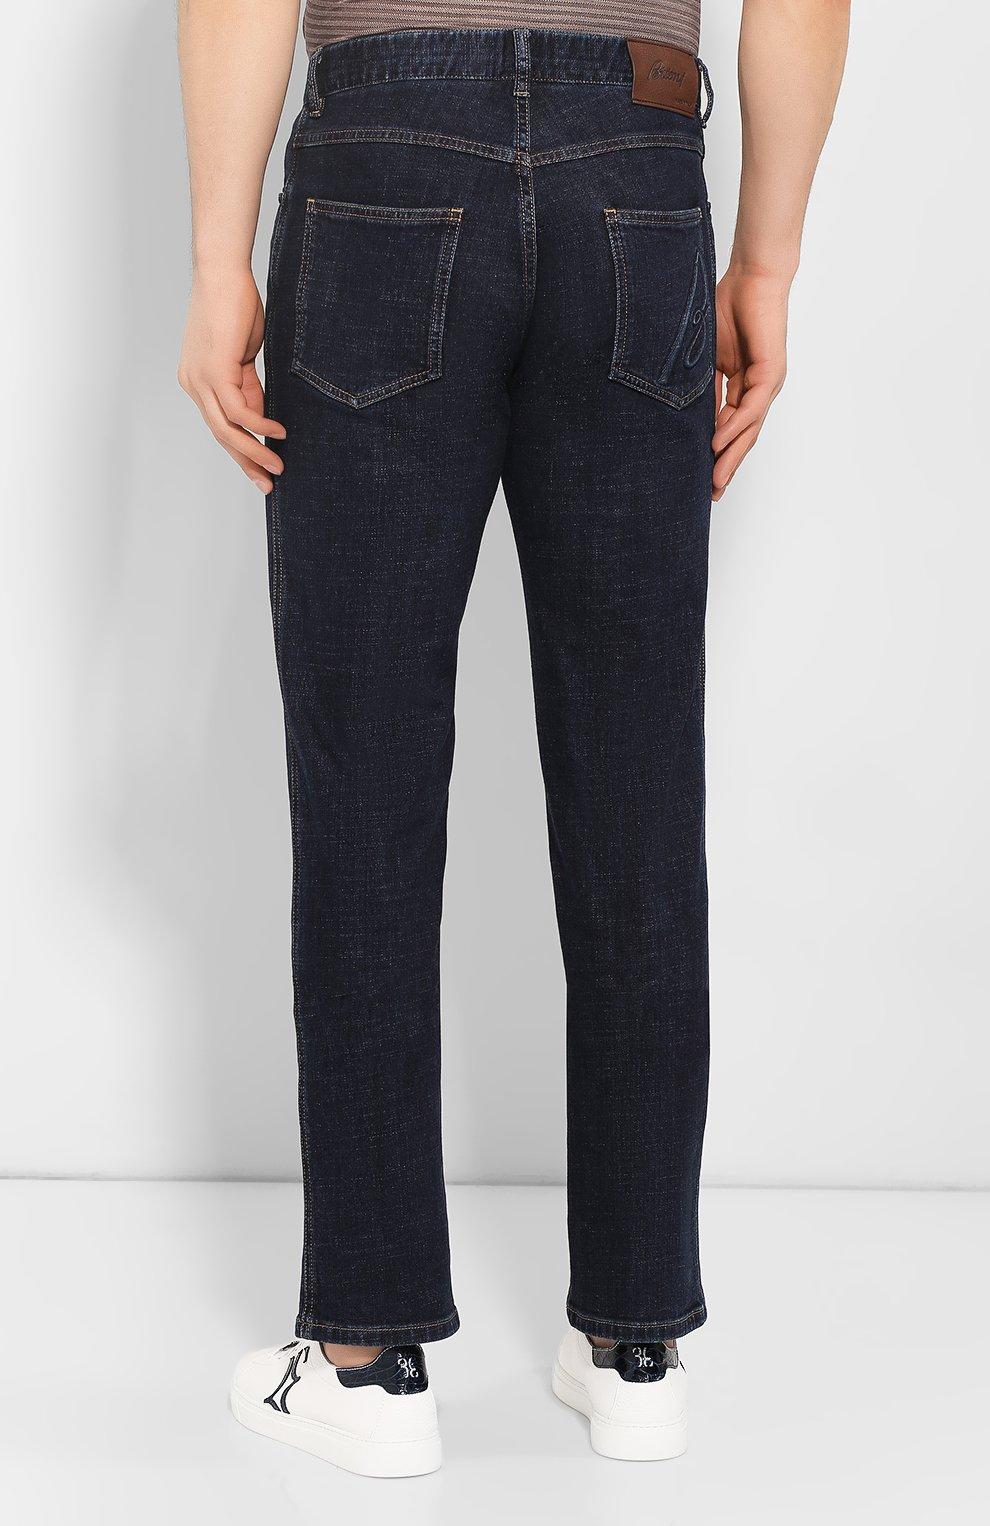 Мужские джинсы BRIONI темно-синего цвета, арт. SPNJ0L/P9D37/STELVI0 | Фото 4